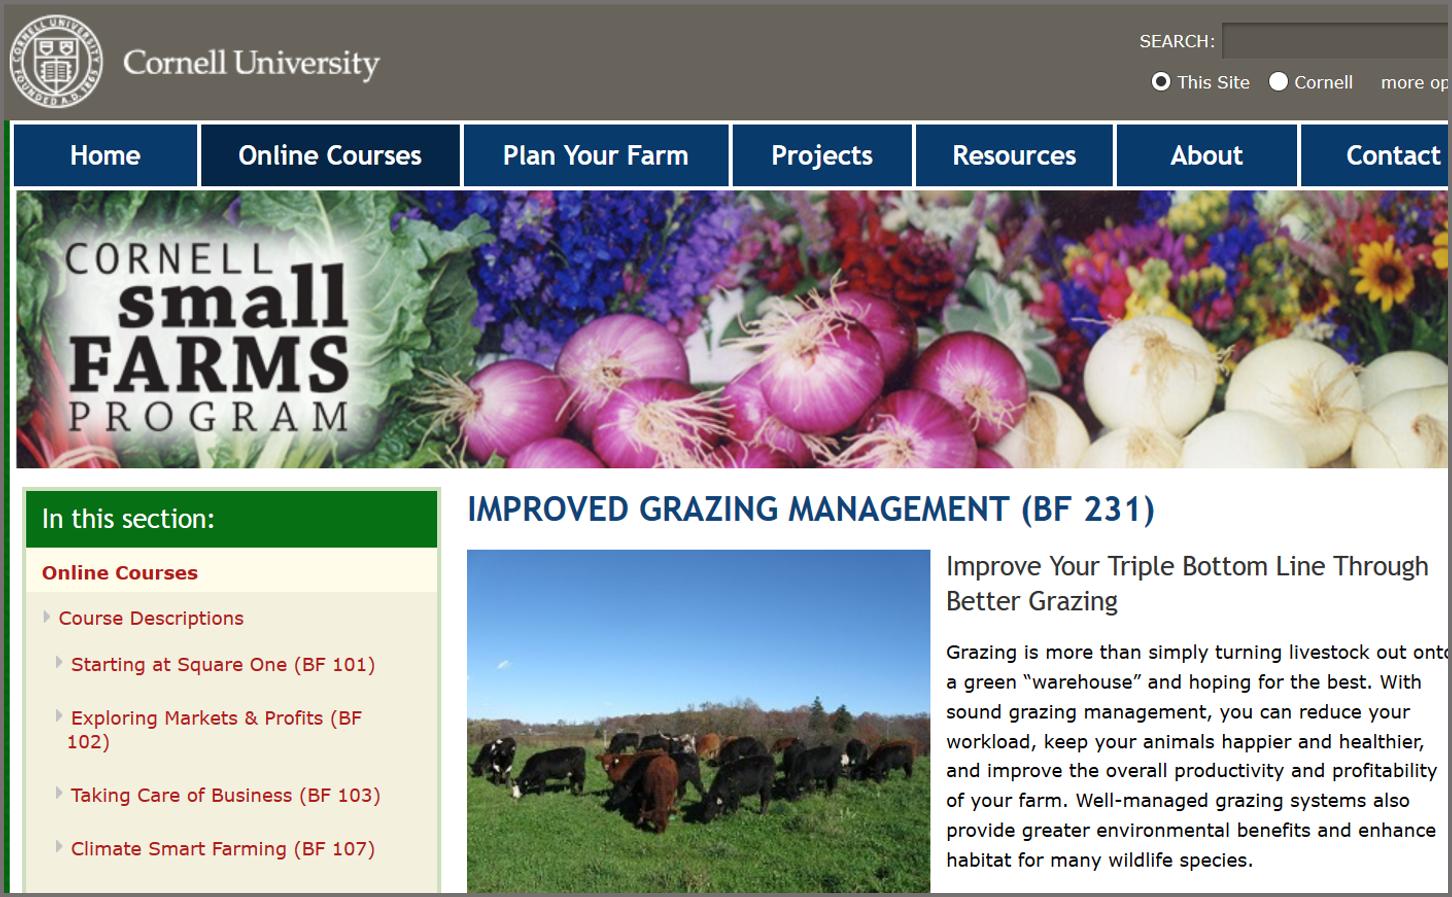 Cornell grazing management course